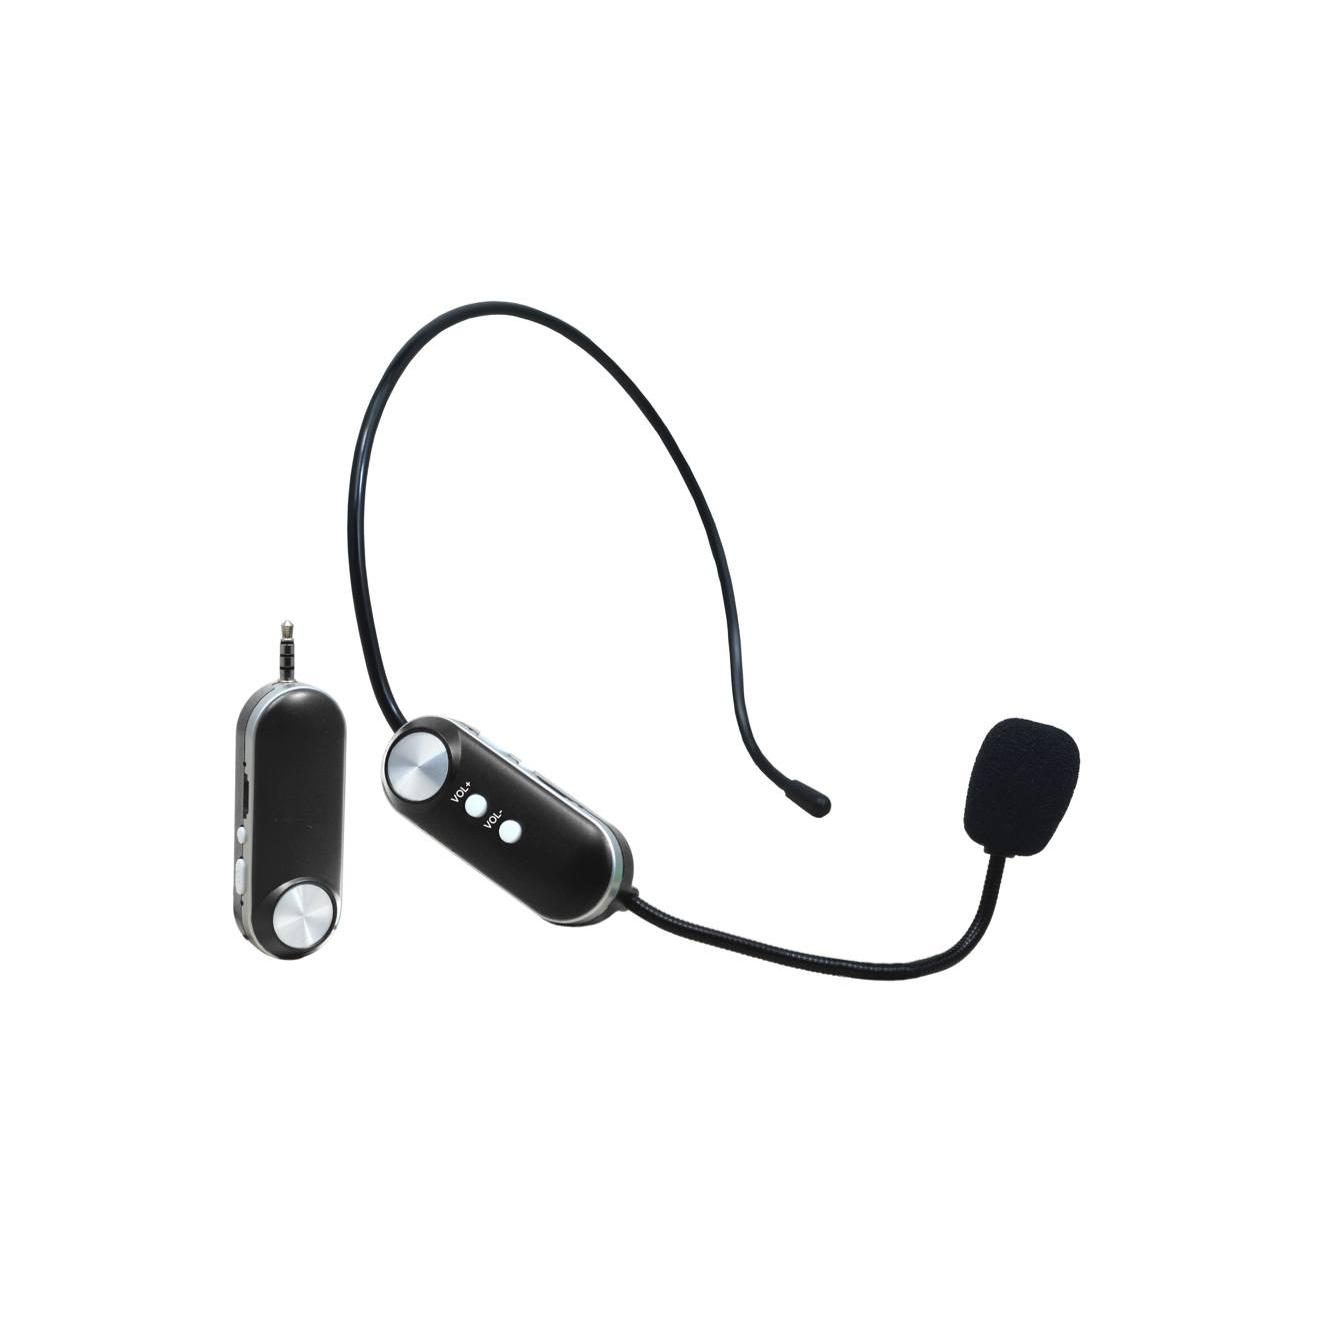 Professional Wireless Microphone UHF Headset - UHF088